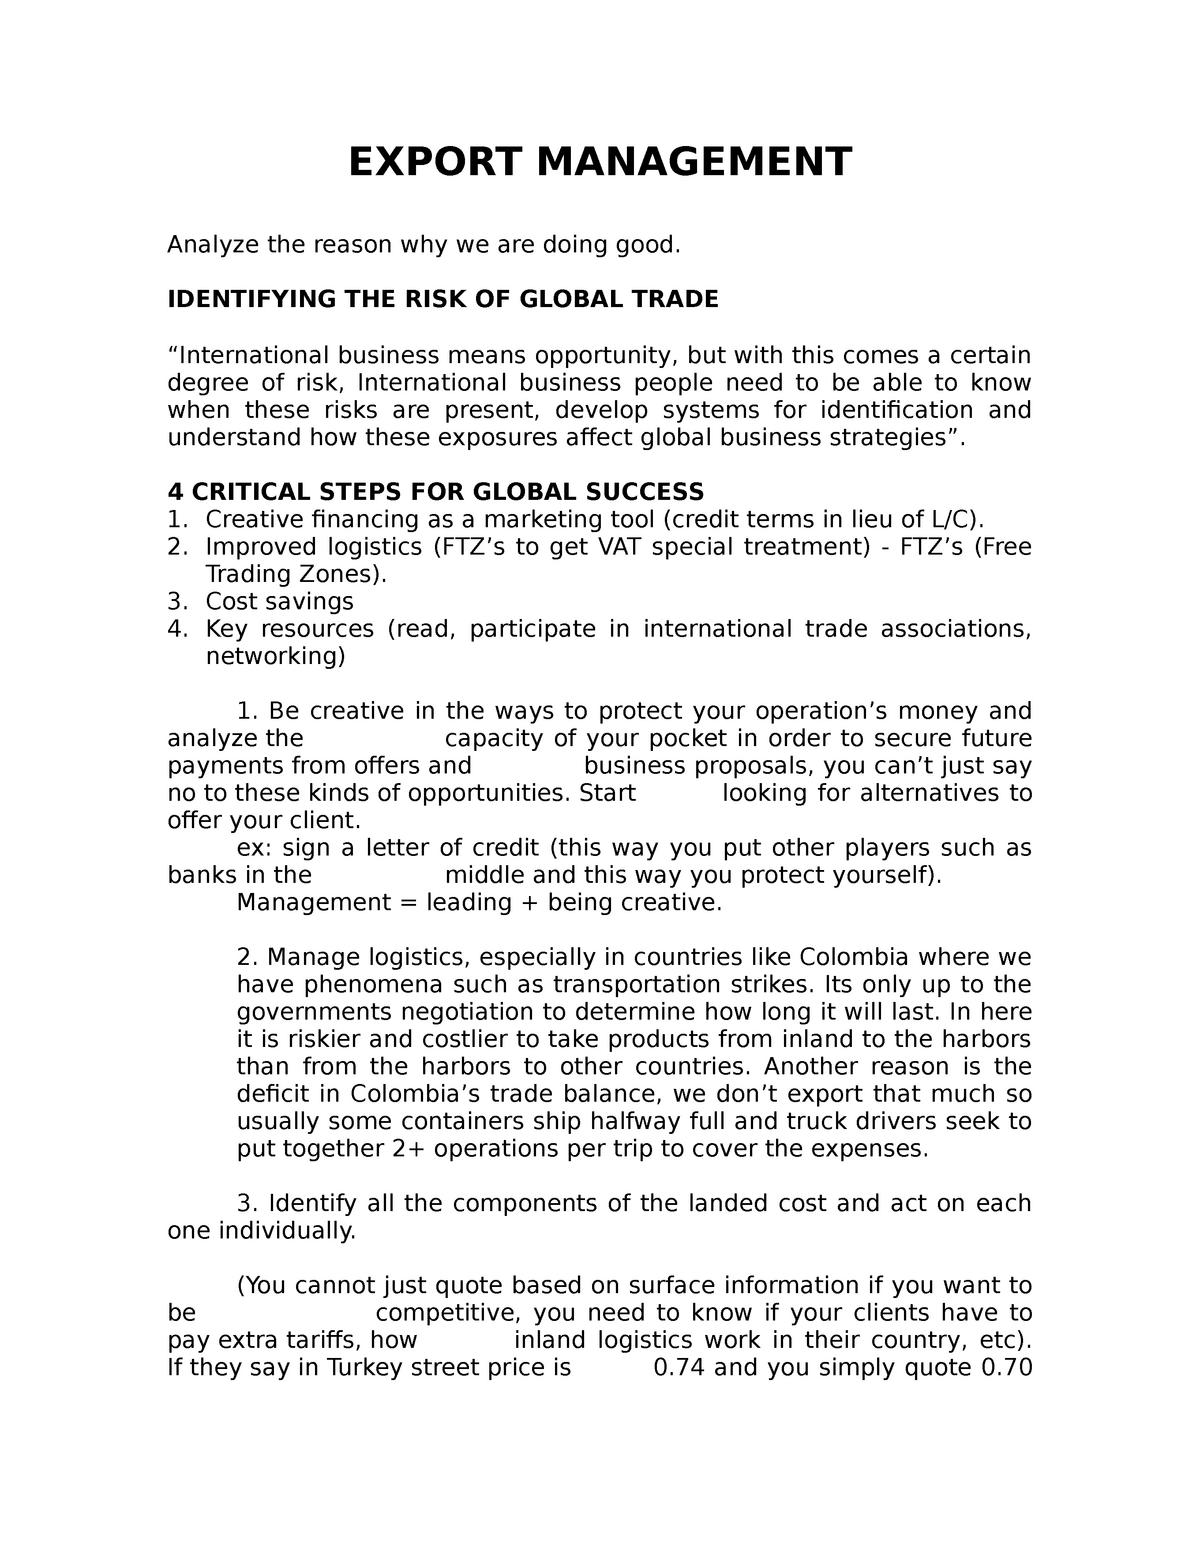 Export Management - NI0100: Mercadeo internacional - StuDocu